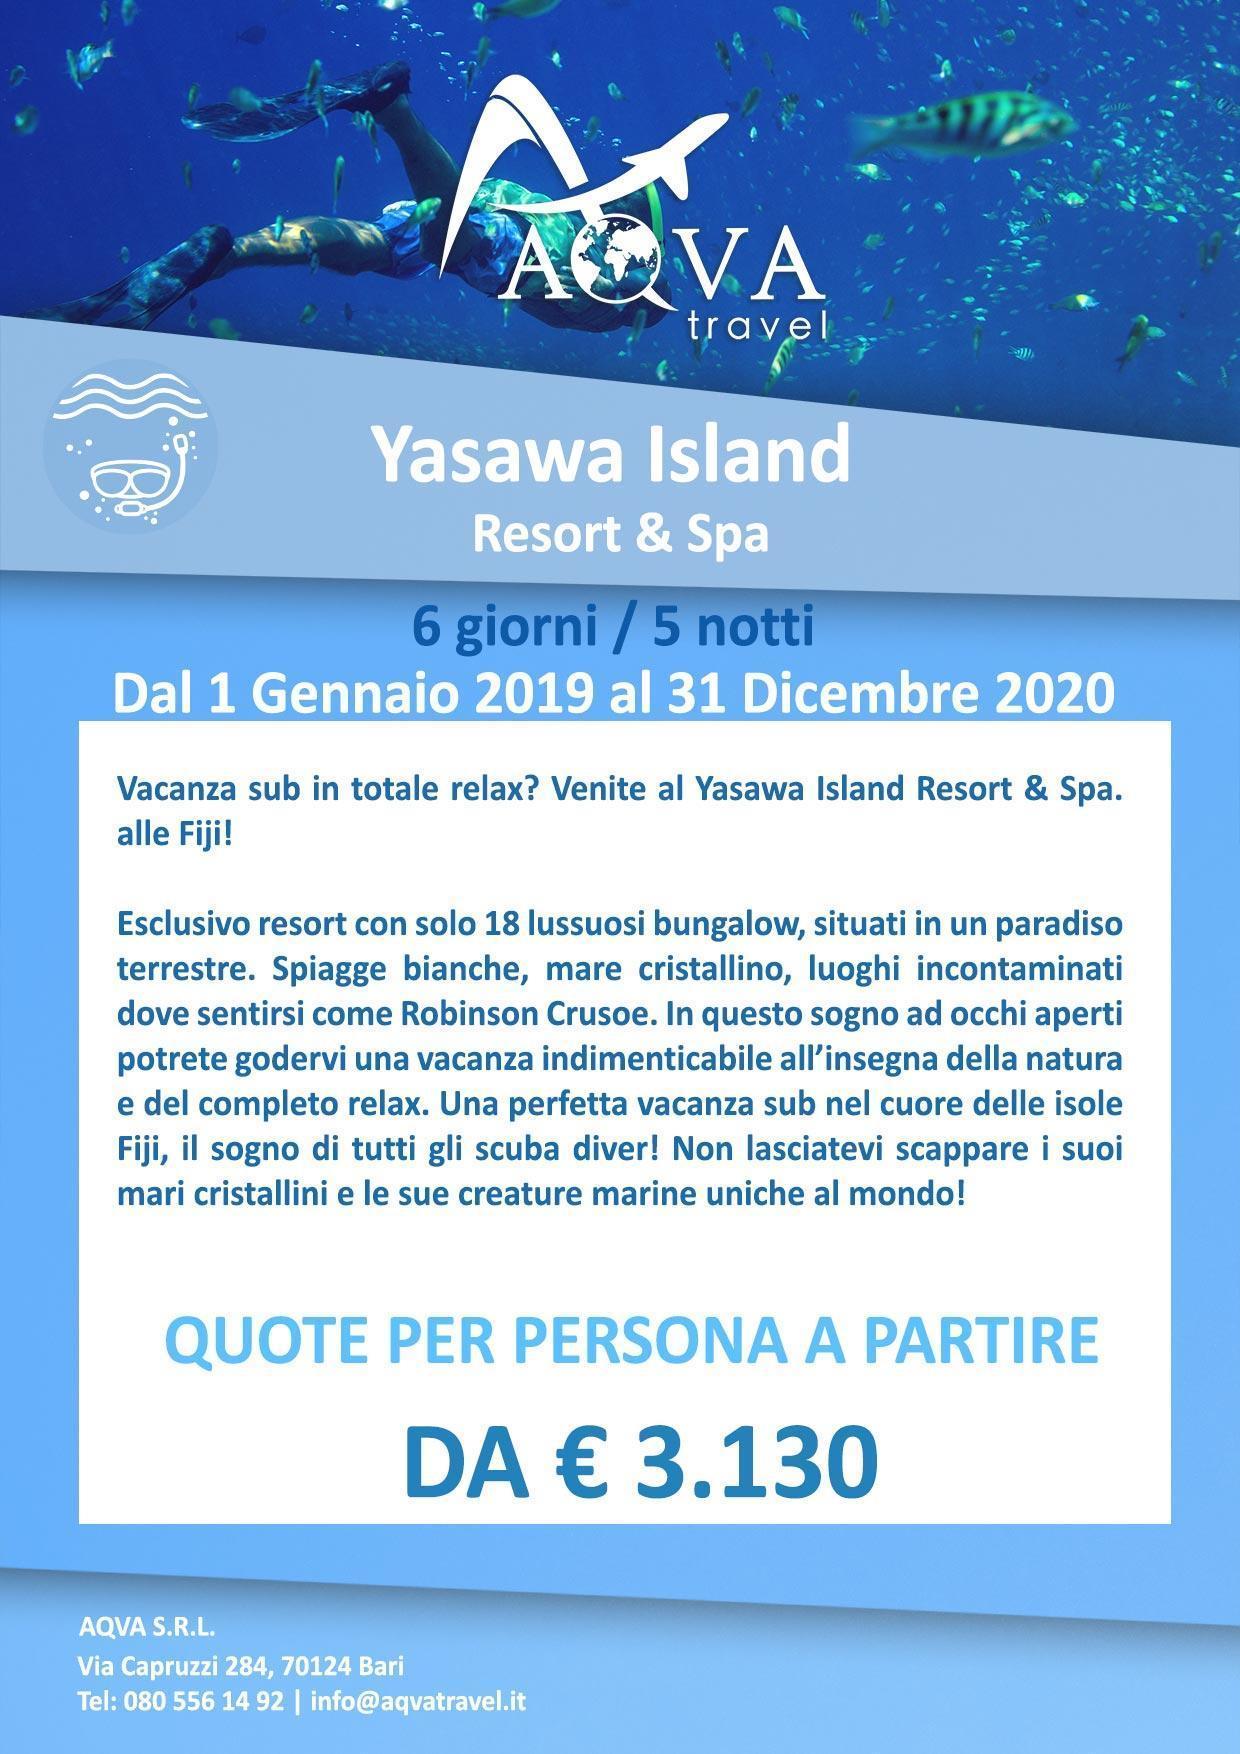 Yasawa-Island-Resort-&-Spa-subacquea-offerte-agenzia-di-viaggi-Bari-AQVATRAVEL-it